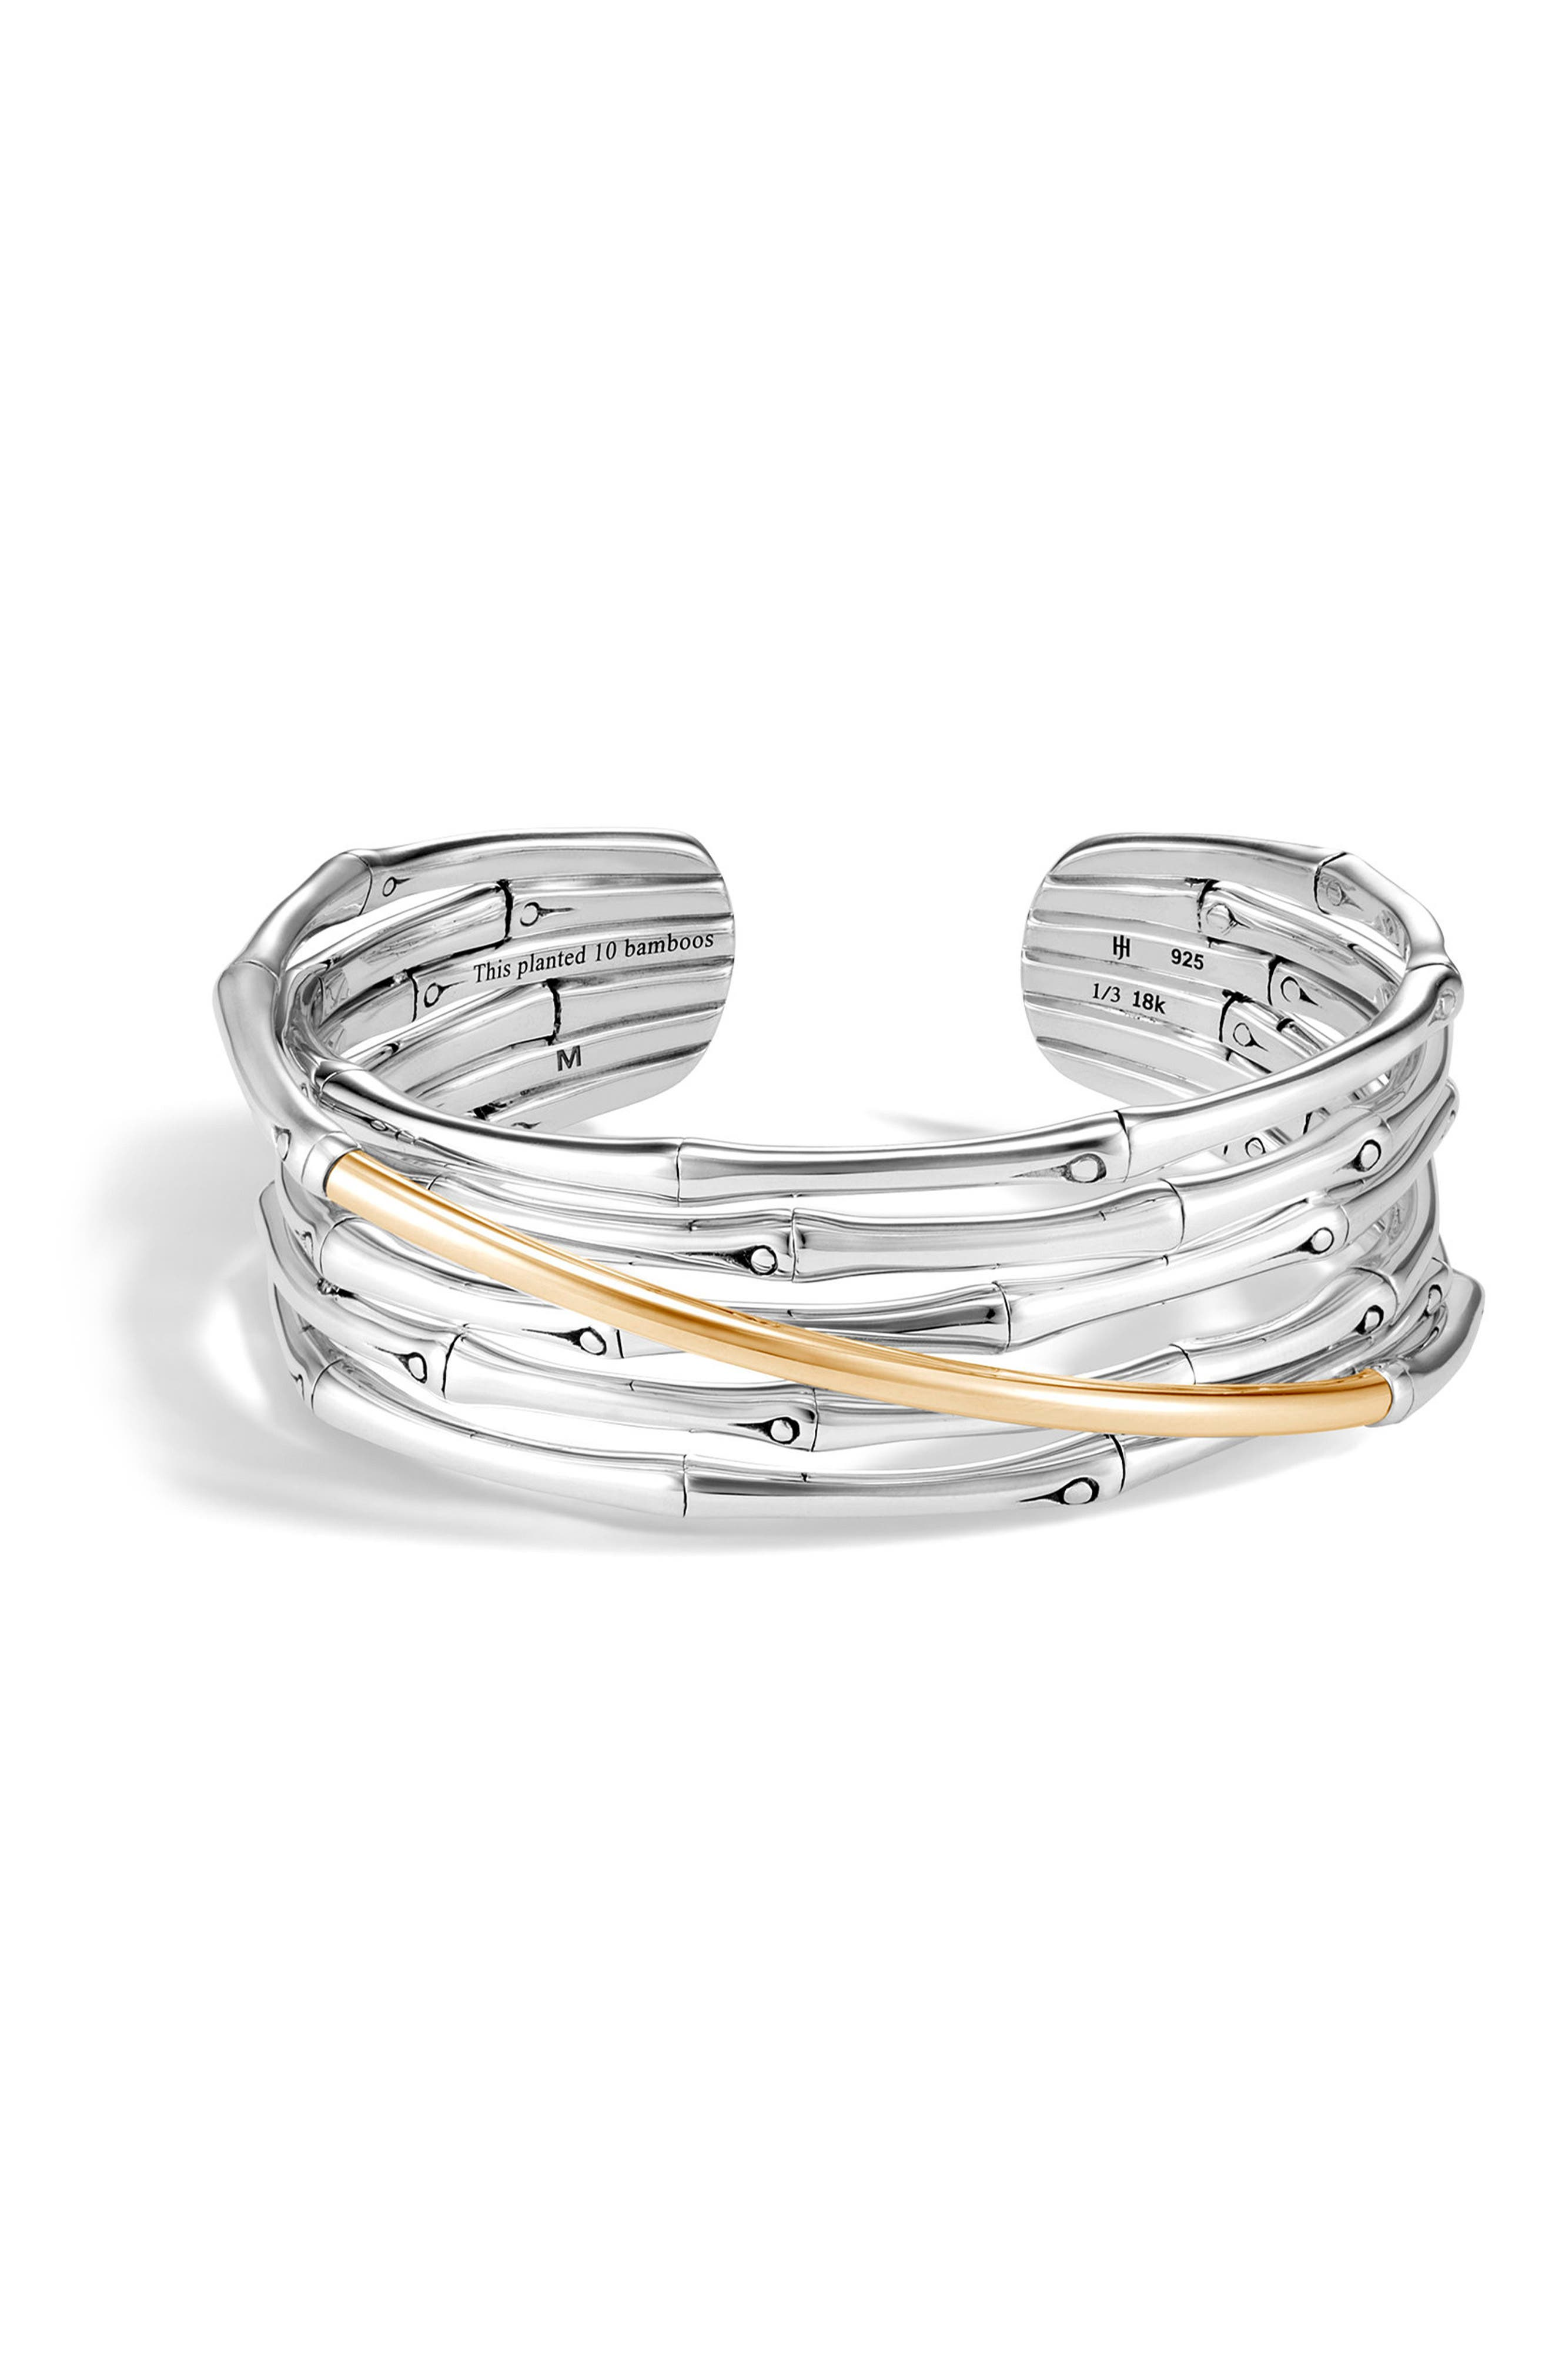 Bamboo 18K Gold & Silver Flex Cuff Bracelet,                             Main thumbnail 1, color,                             Silver/ Gold